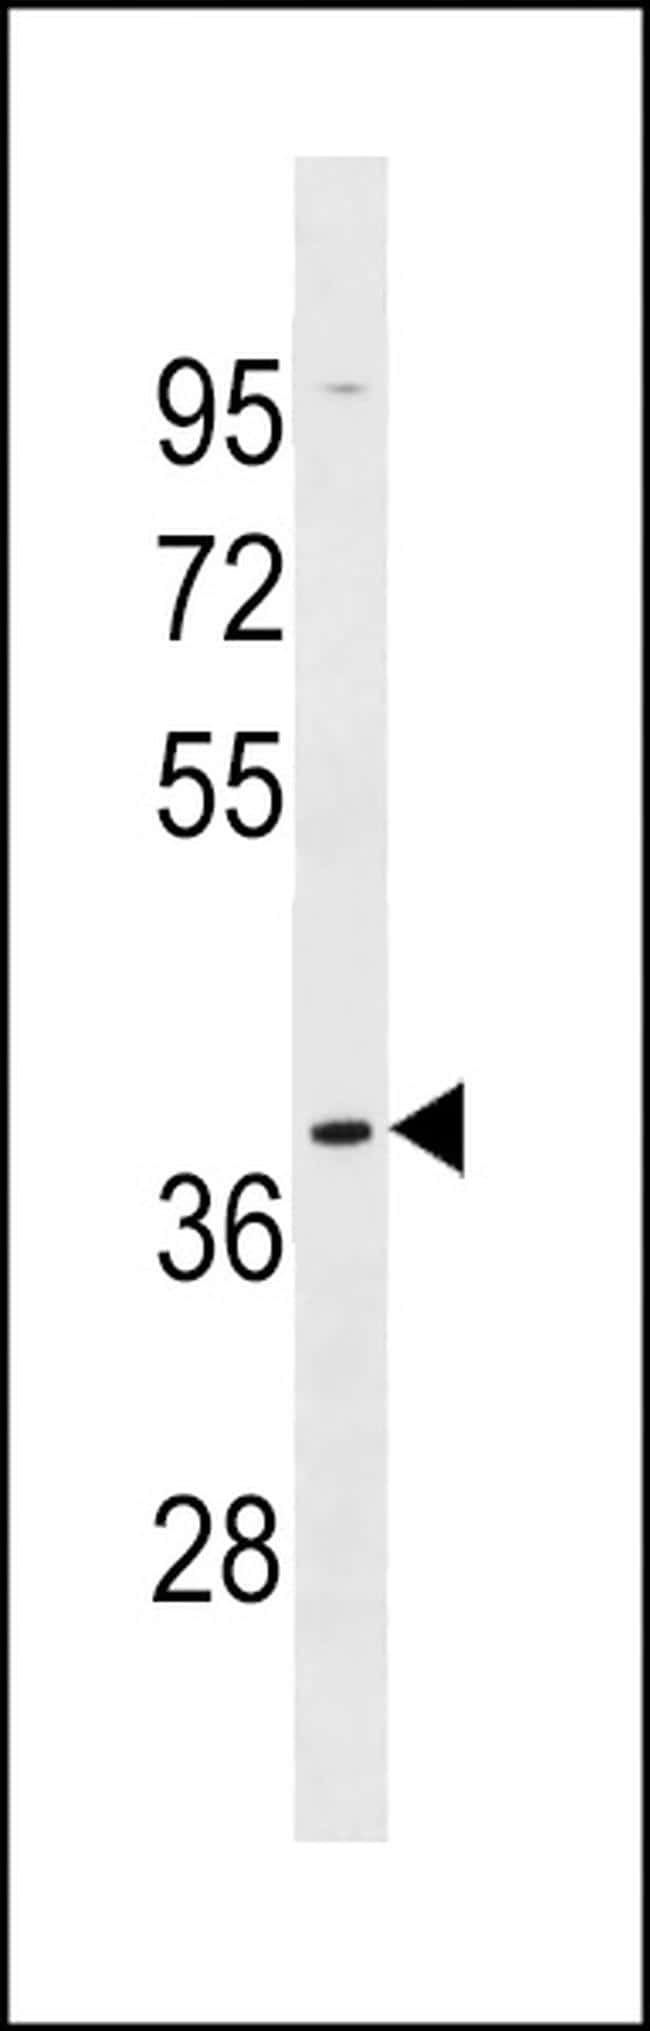 OR5AK2 Antibody in Western Blot (WB)